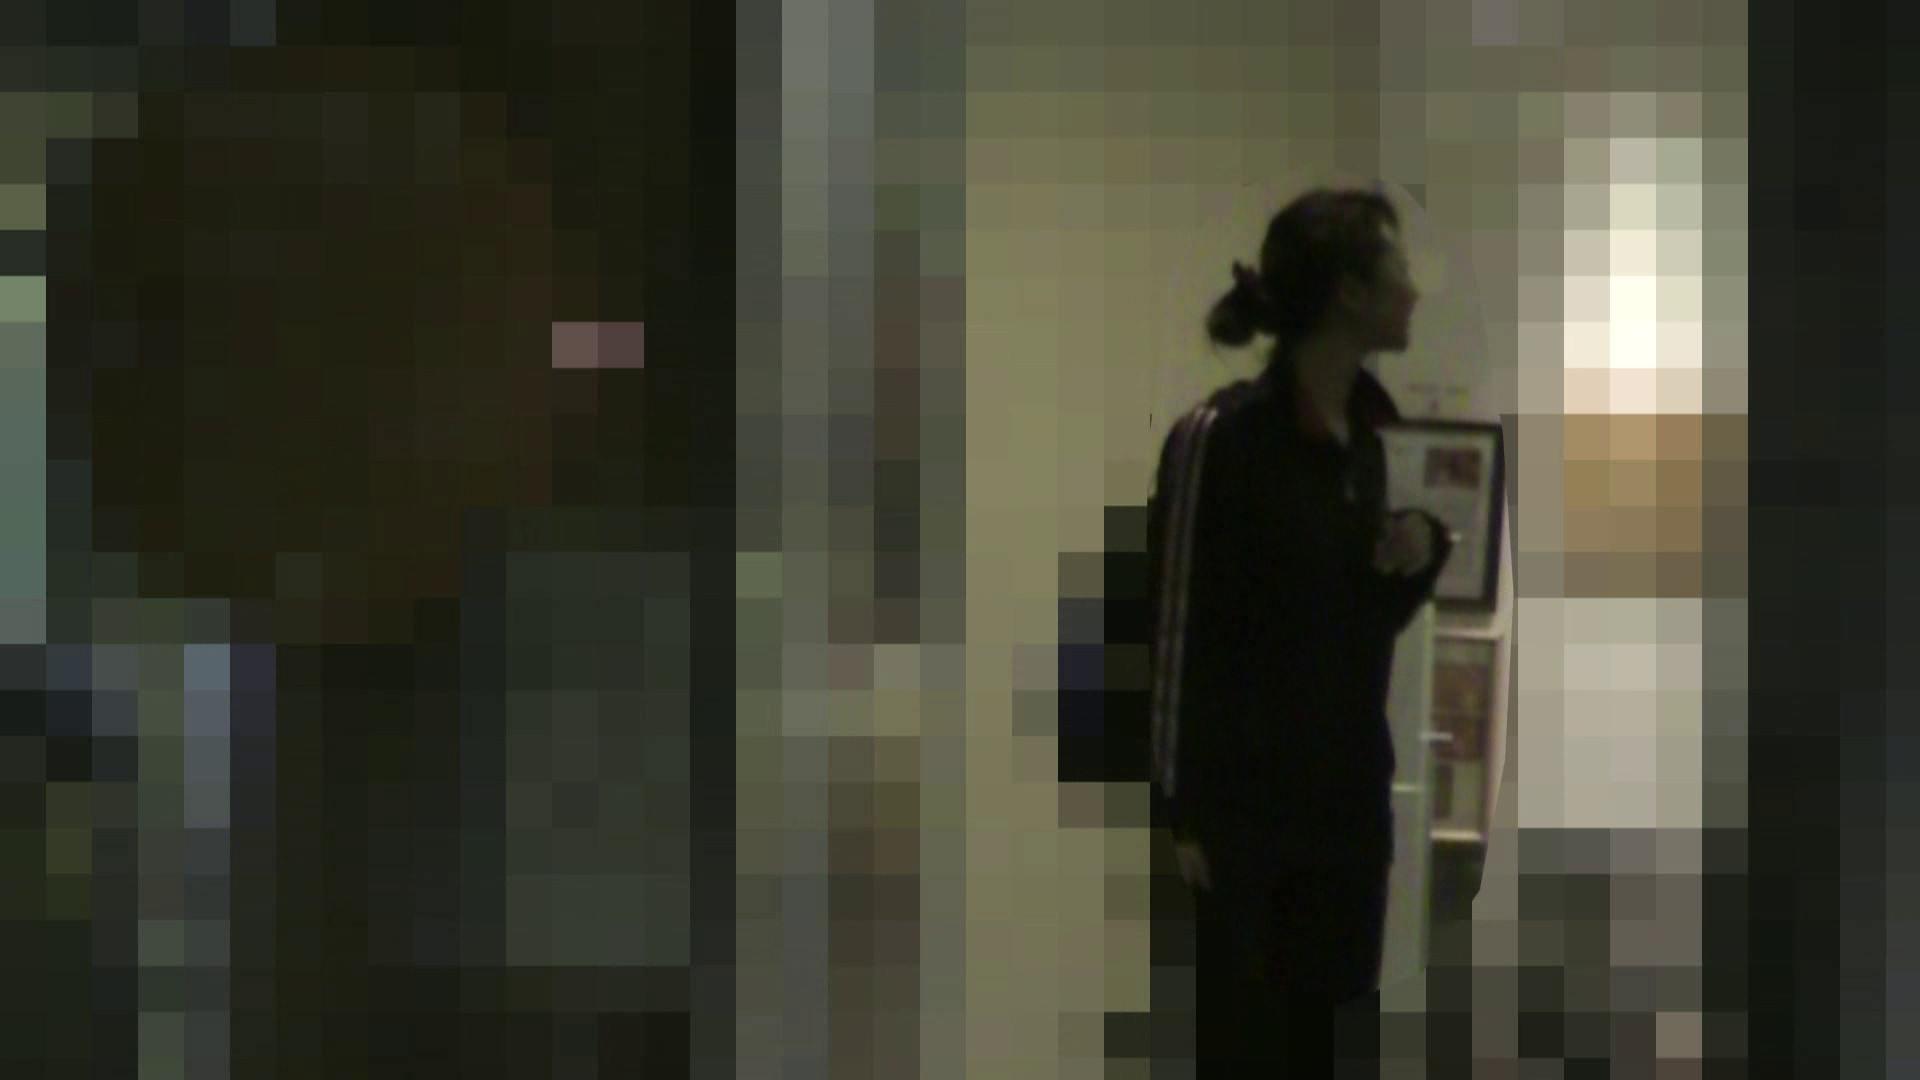 Aquaな露天風呂Vol.356 露天 おまんこ無修正動画無料 85画像 2